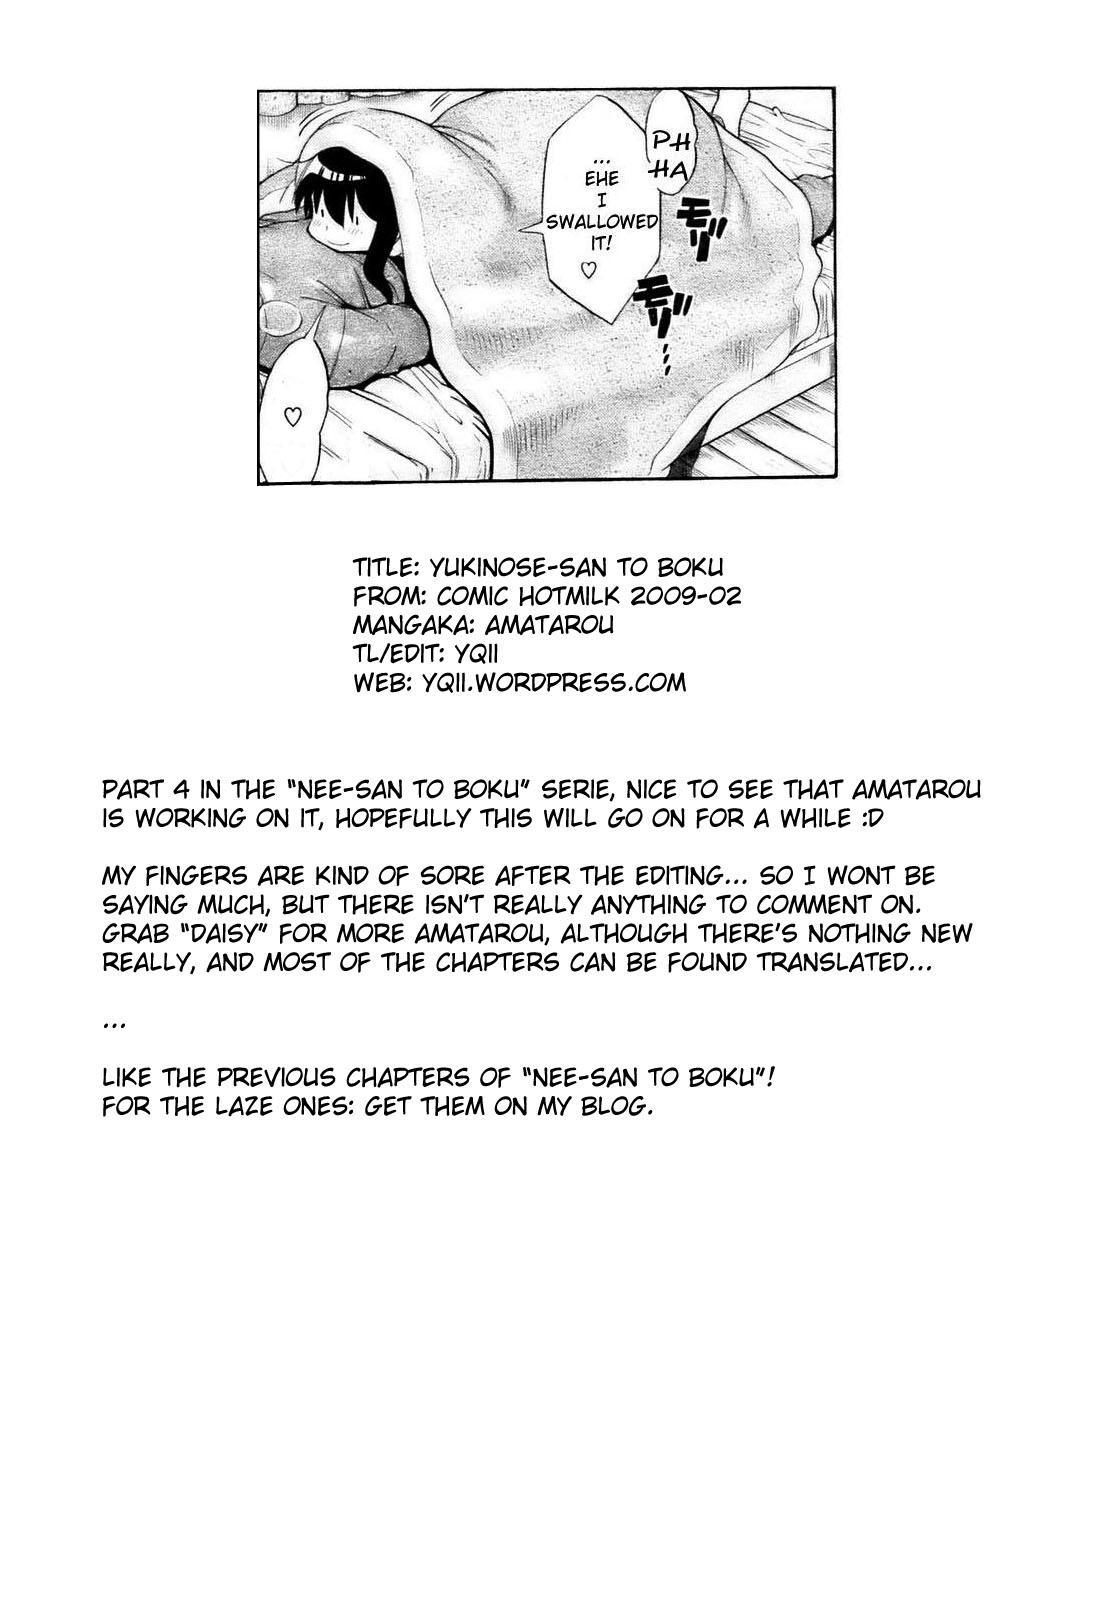 Yukinose-san to Boku 12